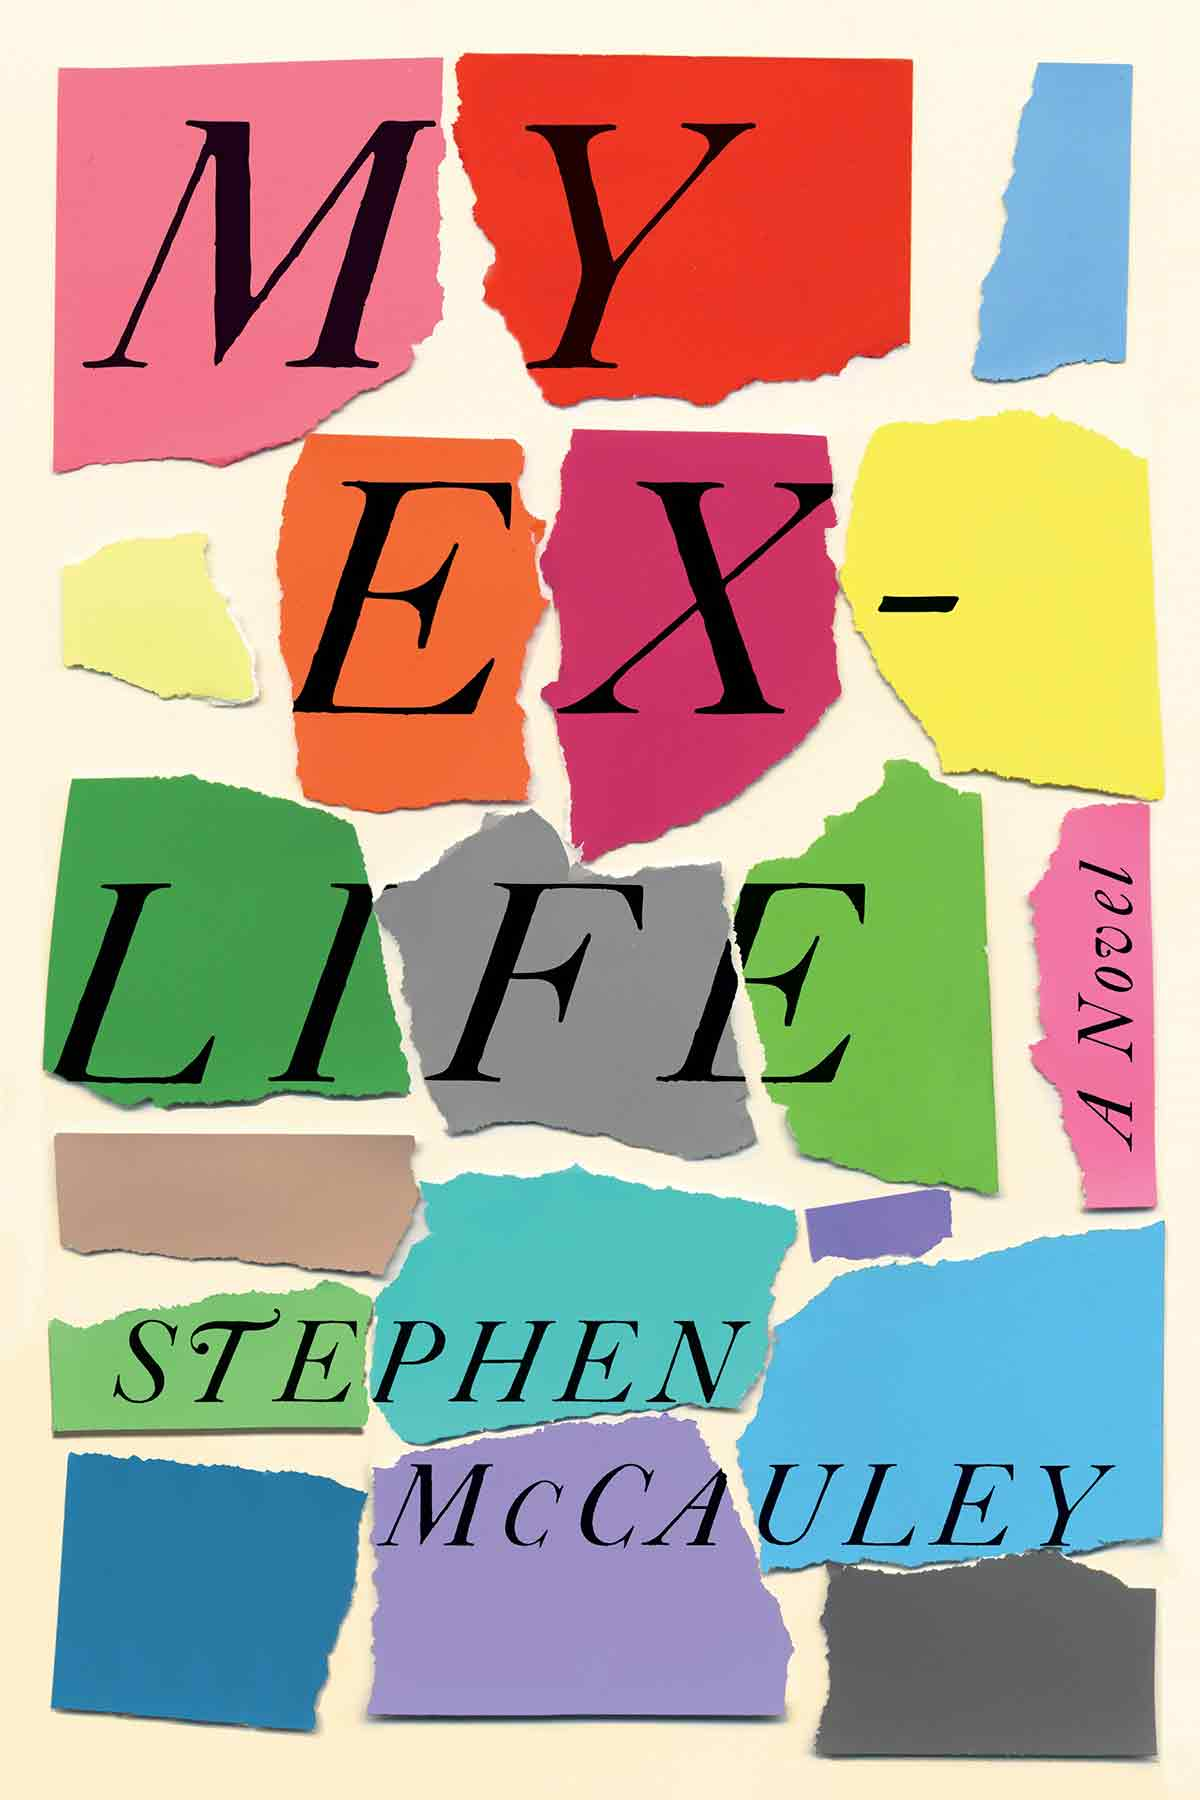 Stephen McCauley | Official website | My Ex-Life